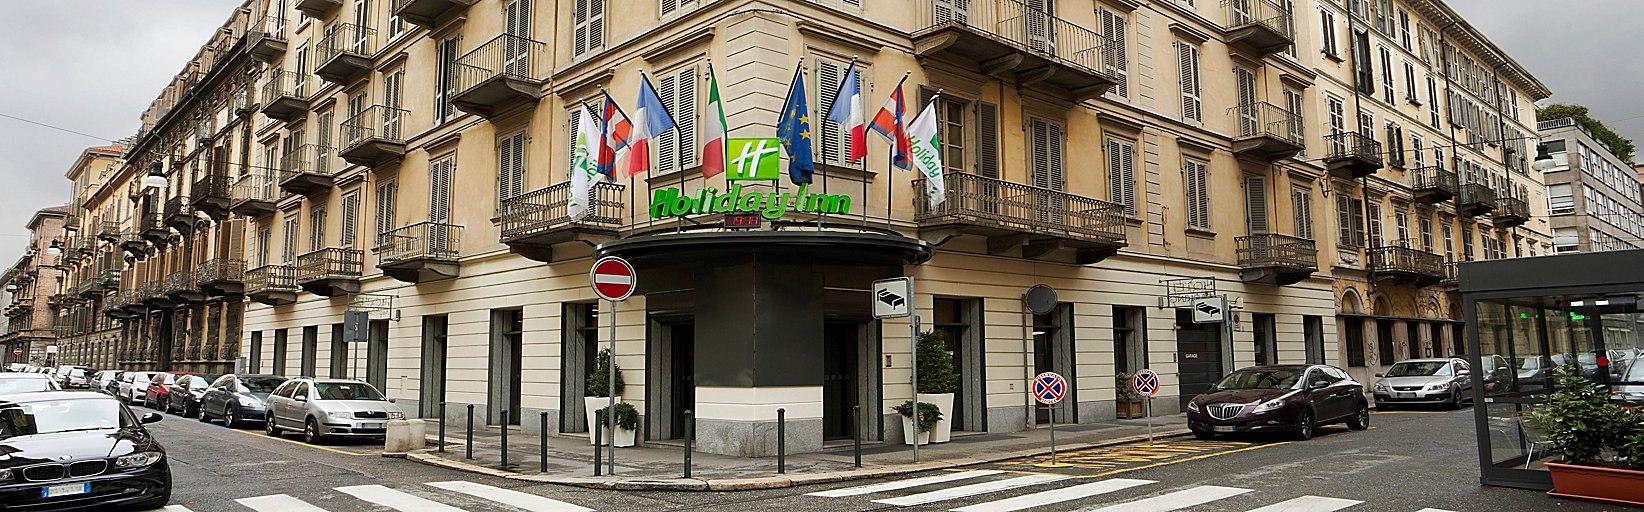 Chambre D Hote A Turin Italie